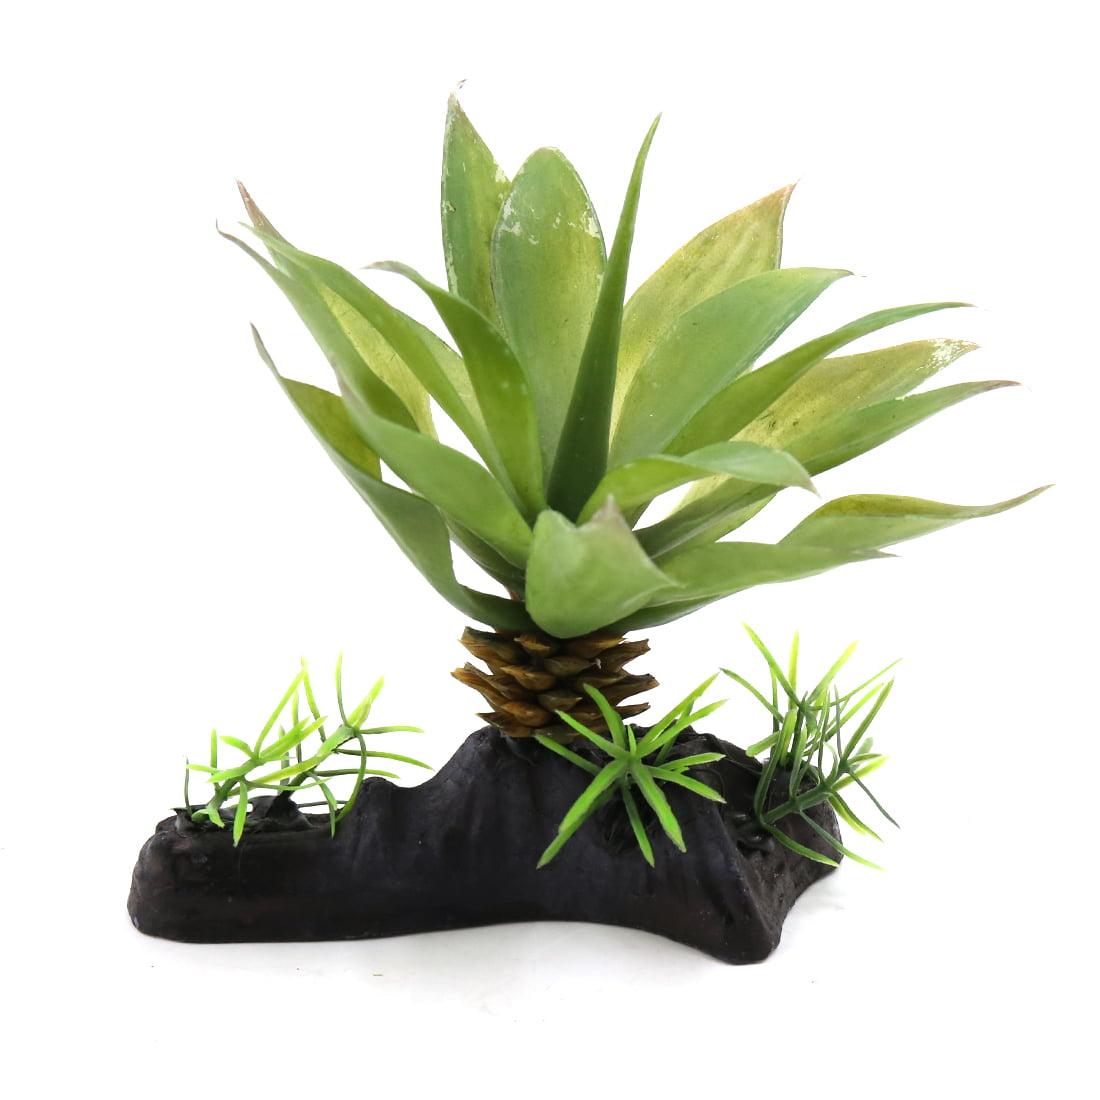 Green Plastic Fish Tank Terrarium Leaves Plant Ornament for Reptiles Animals by Unique-Bargains